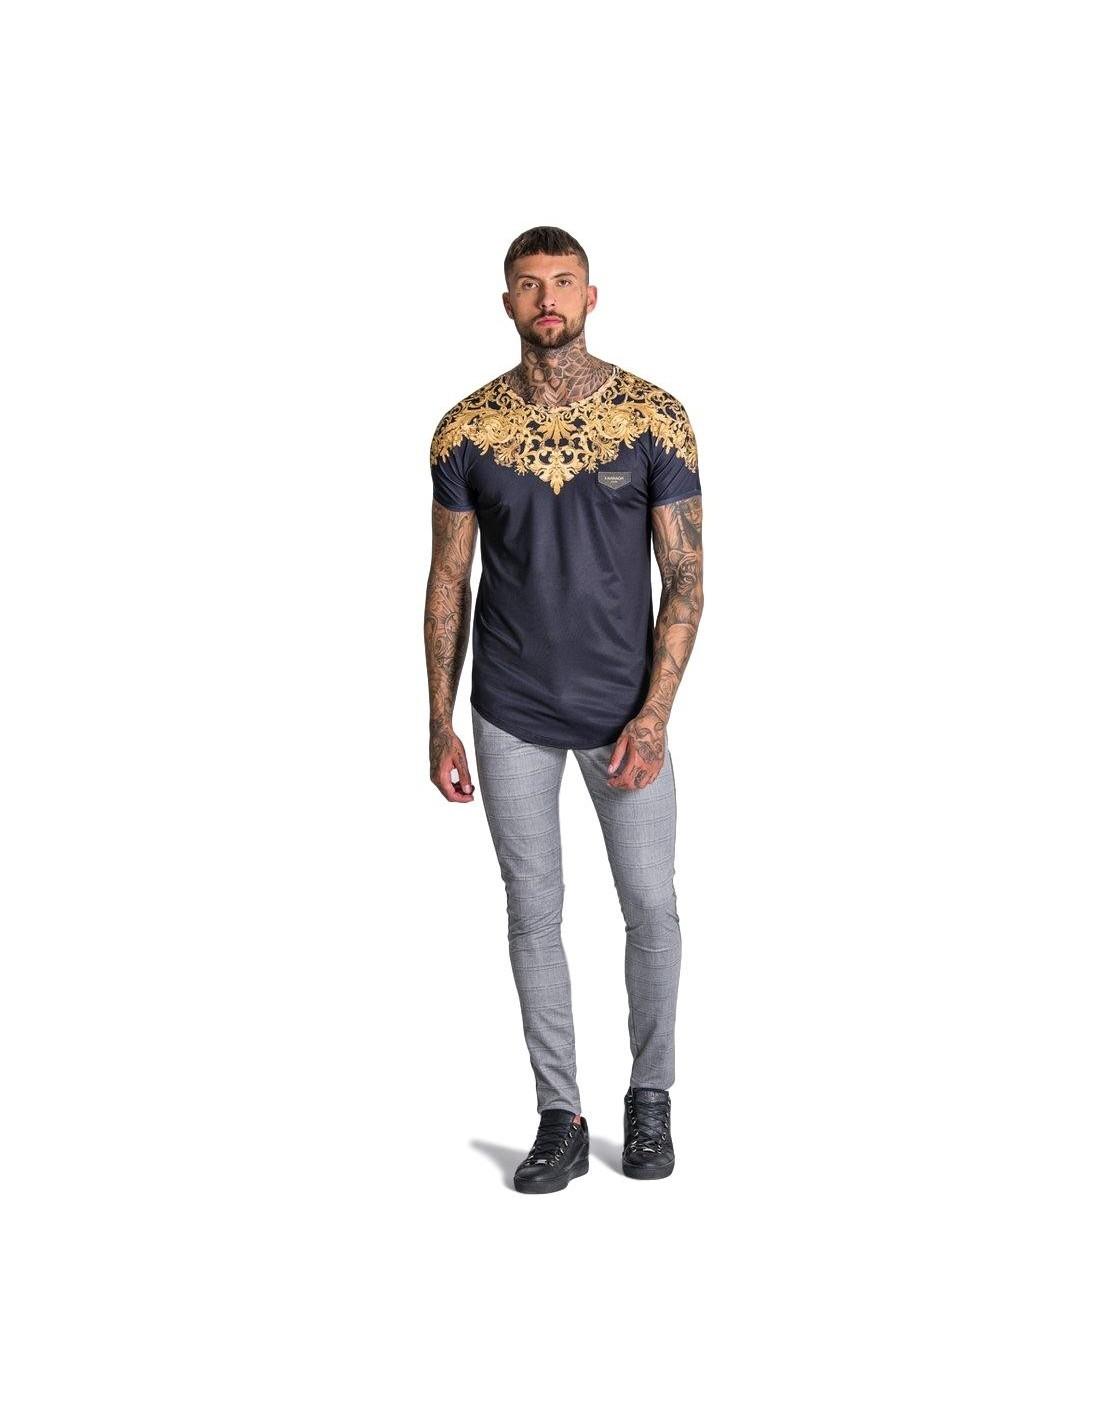 Camiseta Gianni Kavanagh GK LTD Edition 078